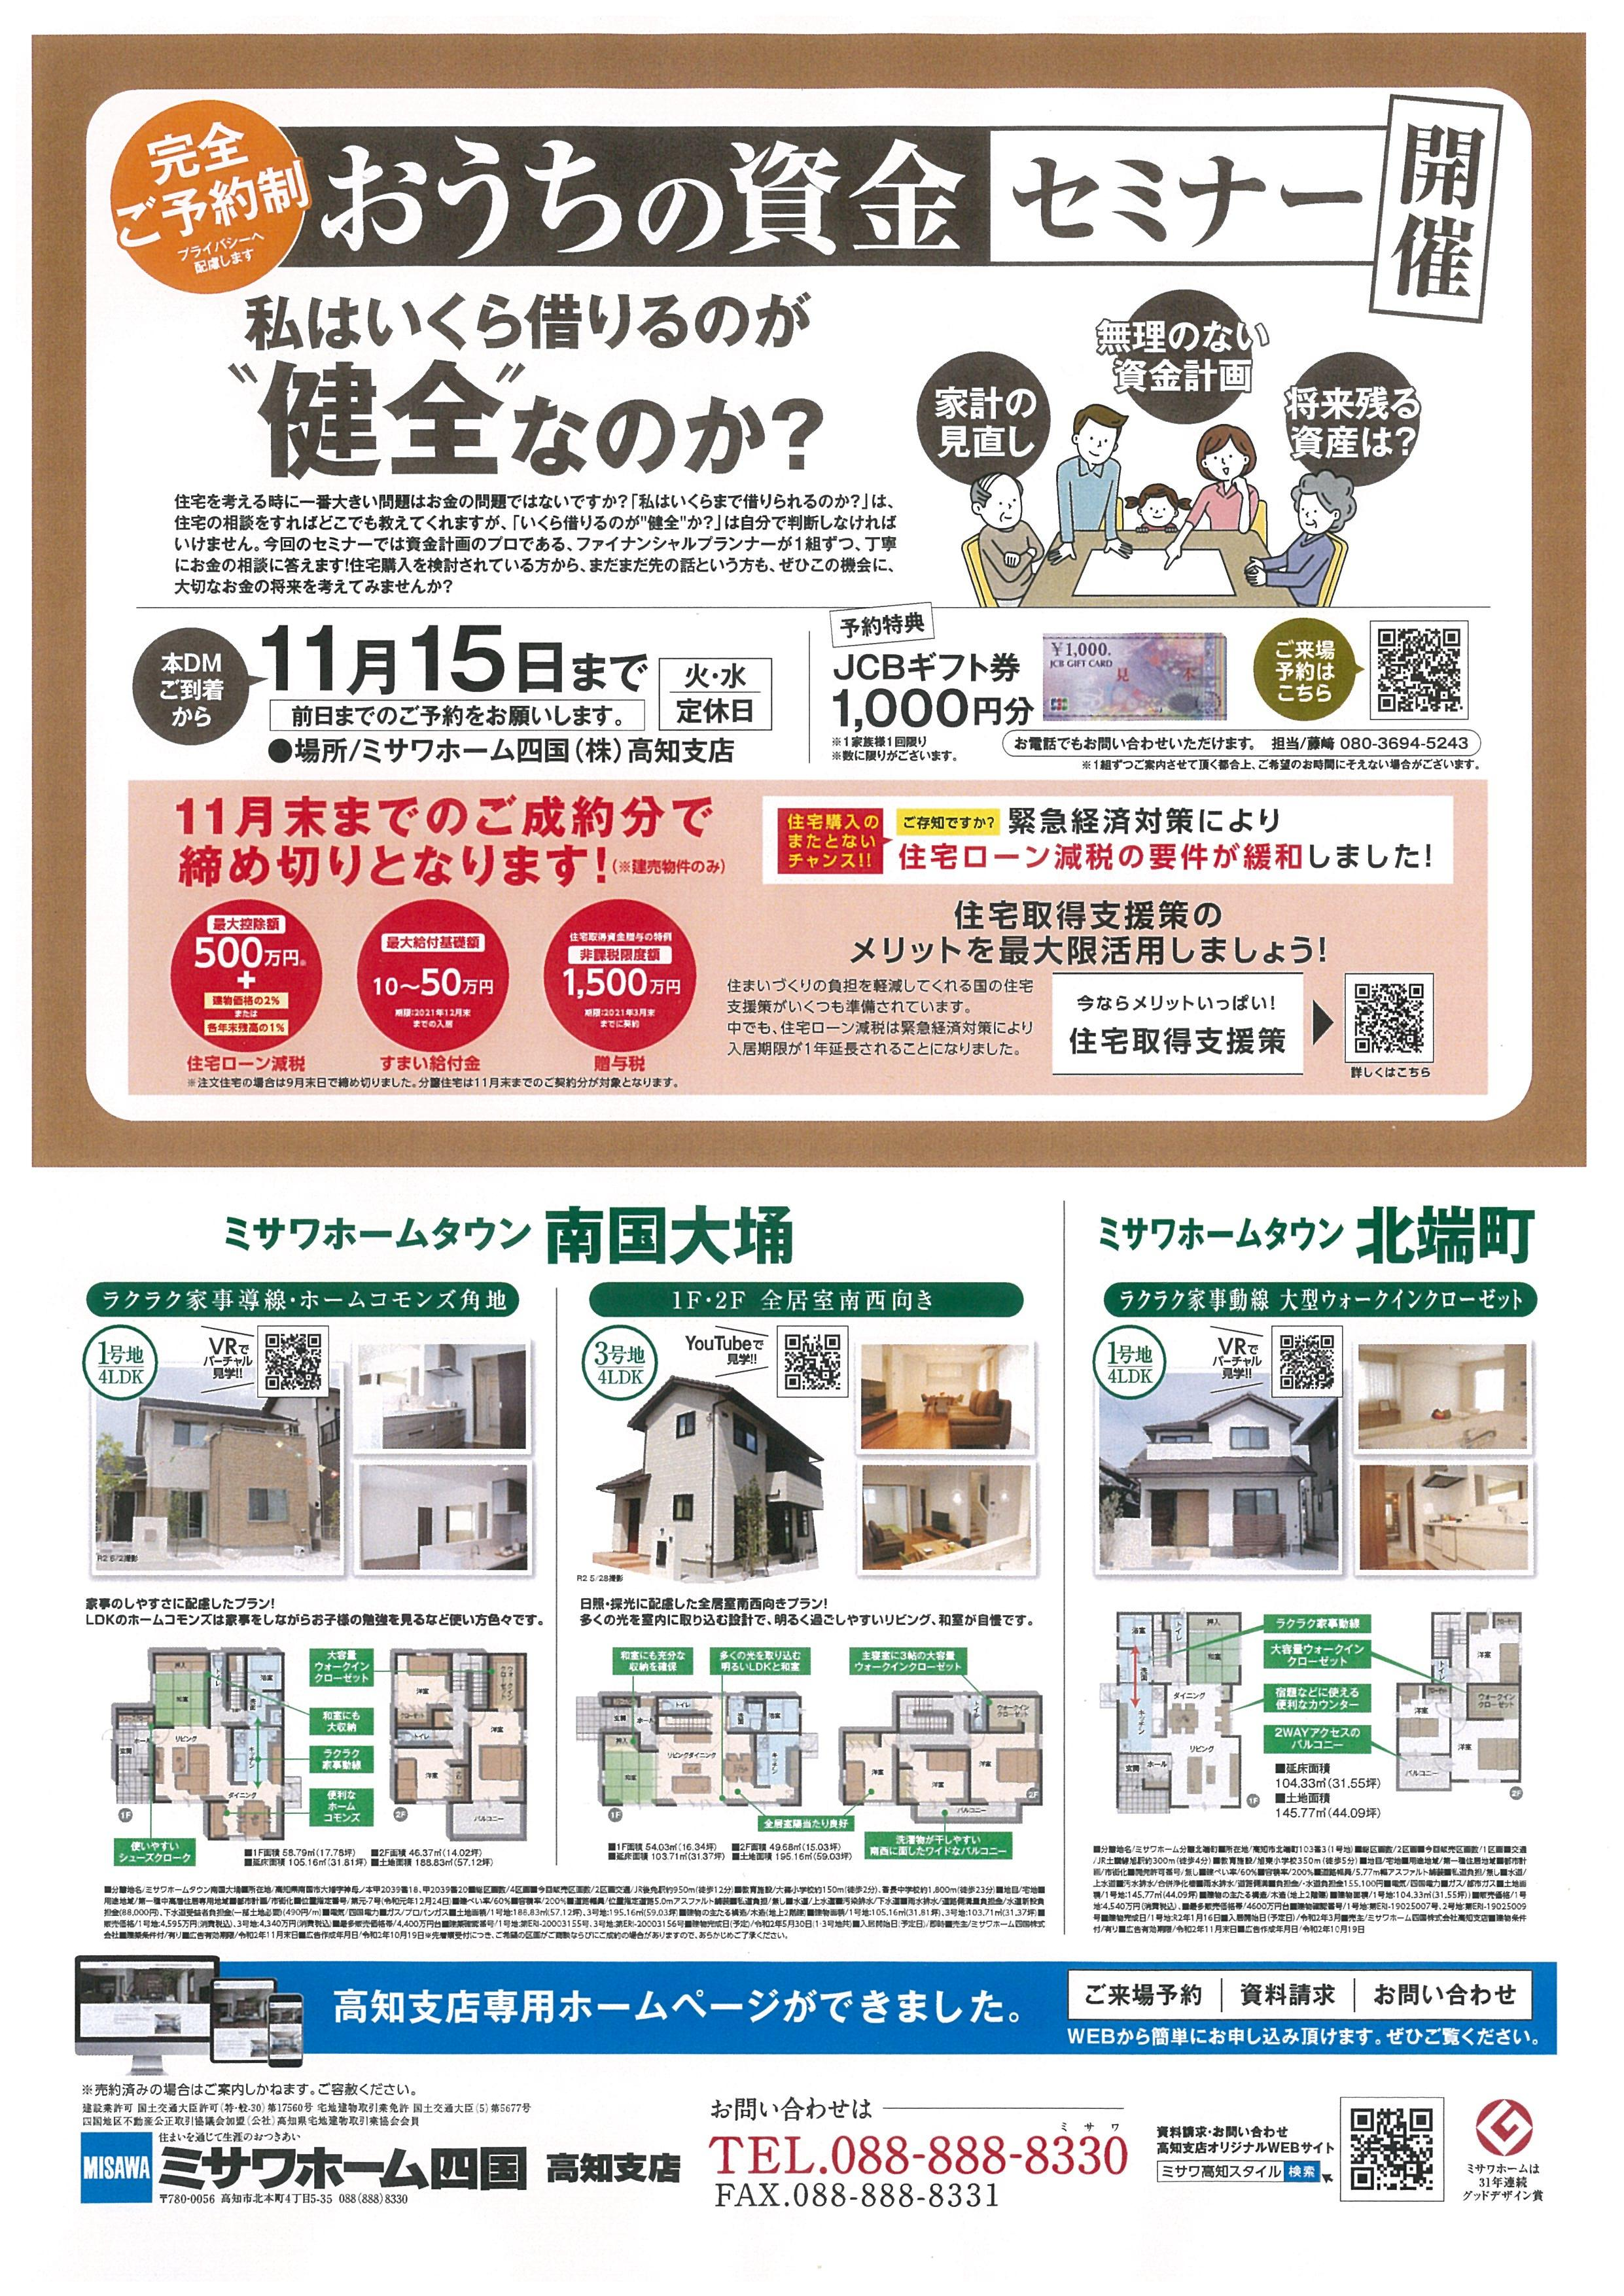 https://shikoku.misawa.co.jp/area_kouchi/20201029165814.jpg